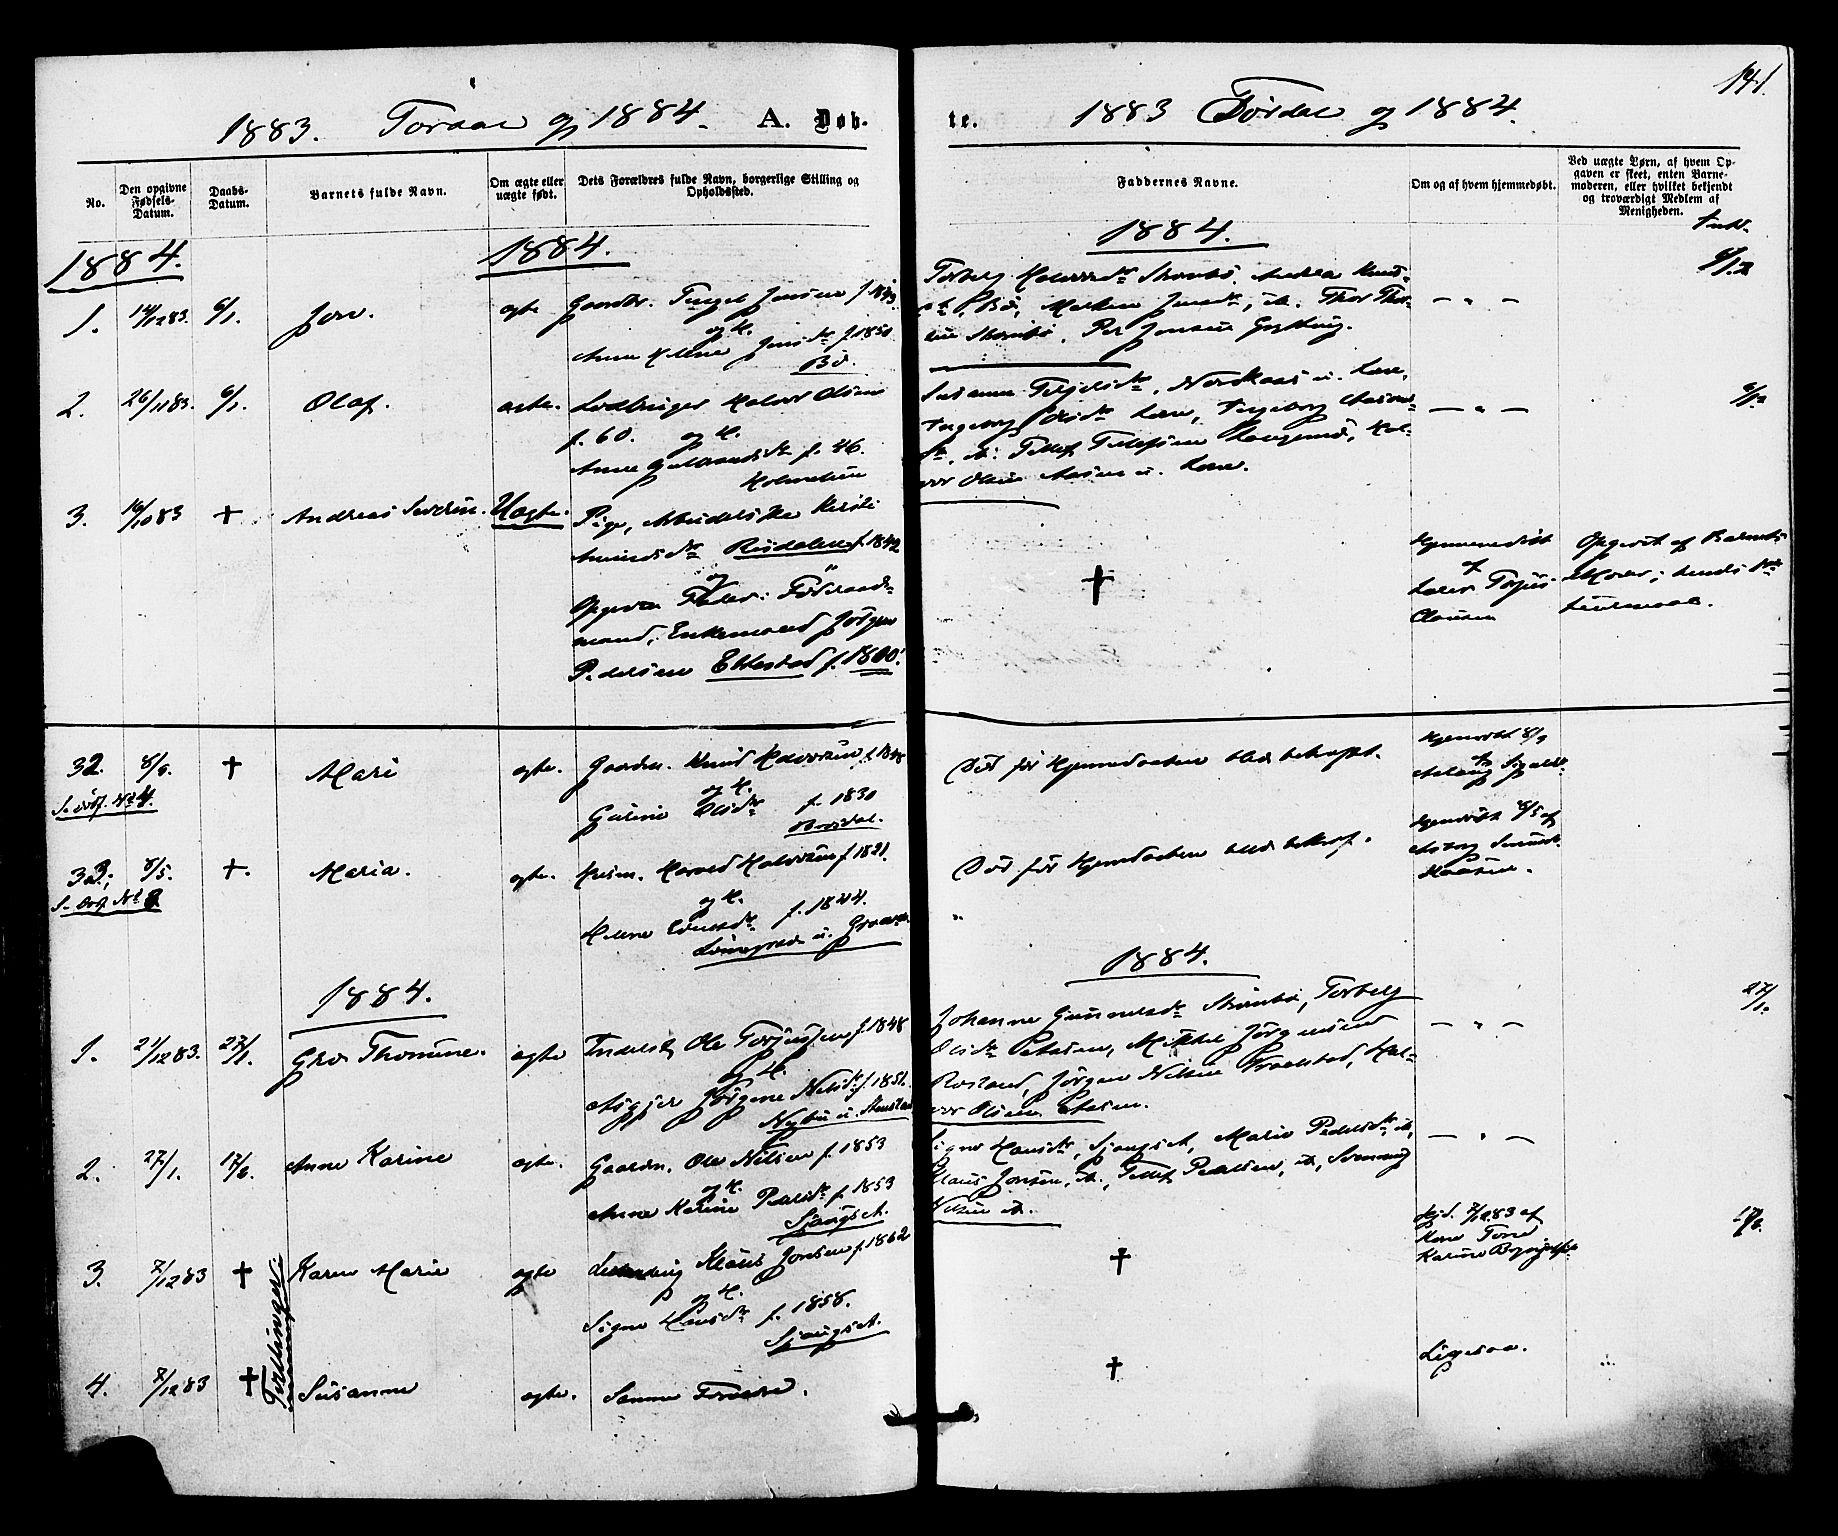 SAKO, Drangedal kirkebøker, F/Fa/L0009: Ministerialbok nr. 9 /2, 1872-1884, s. 141